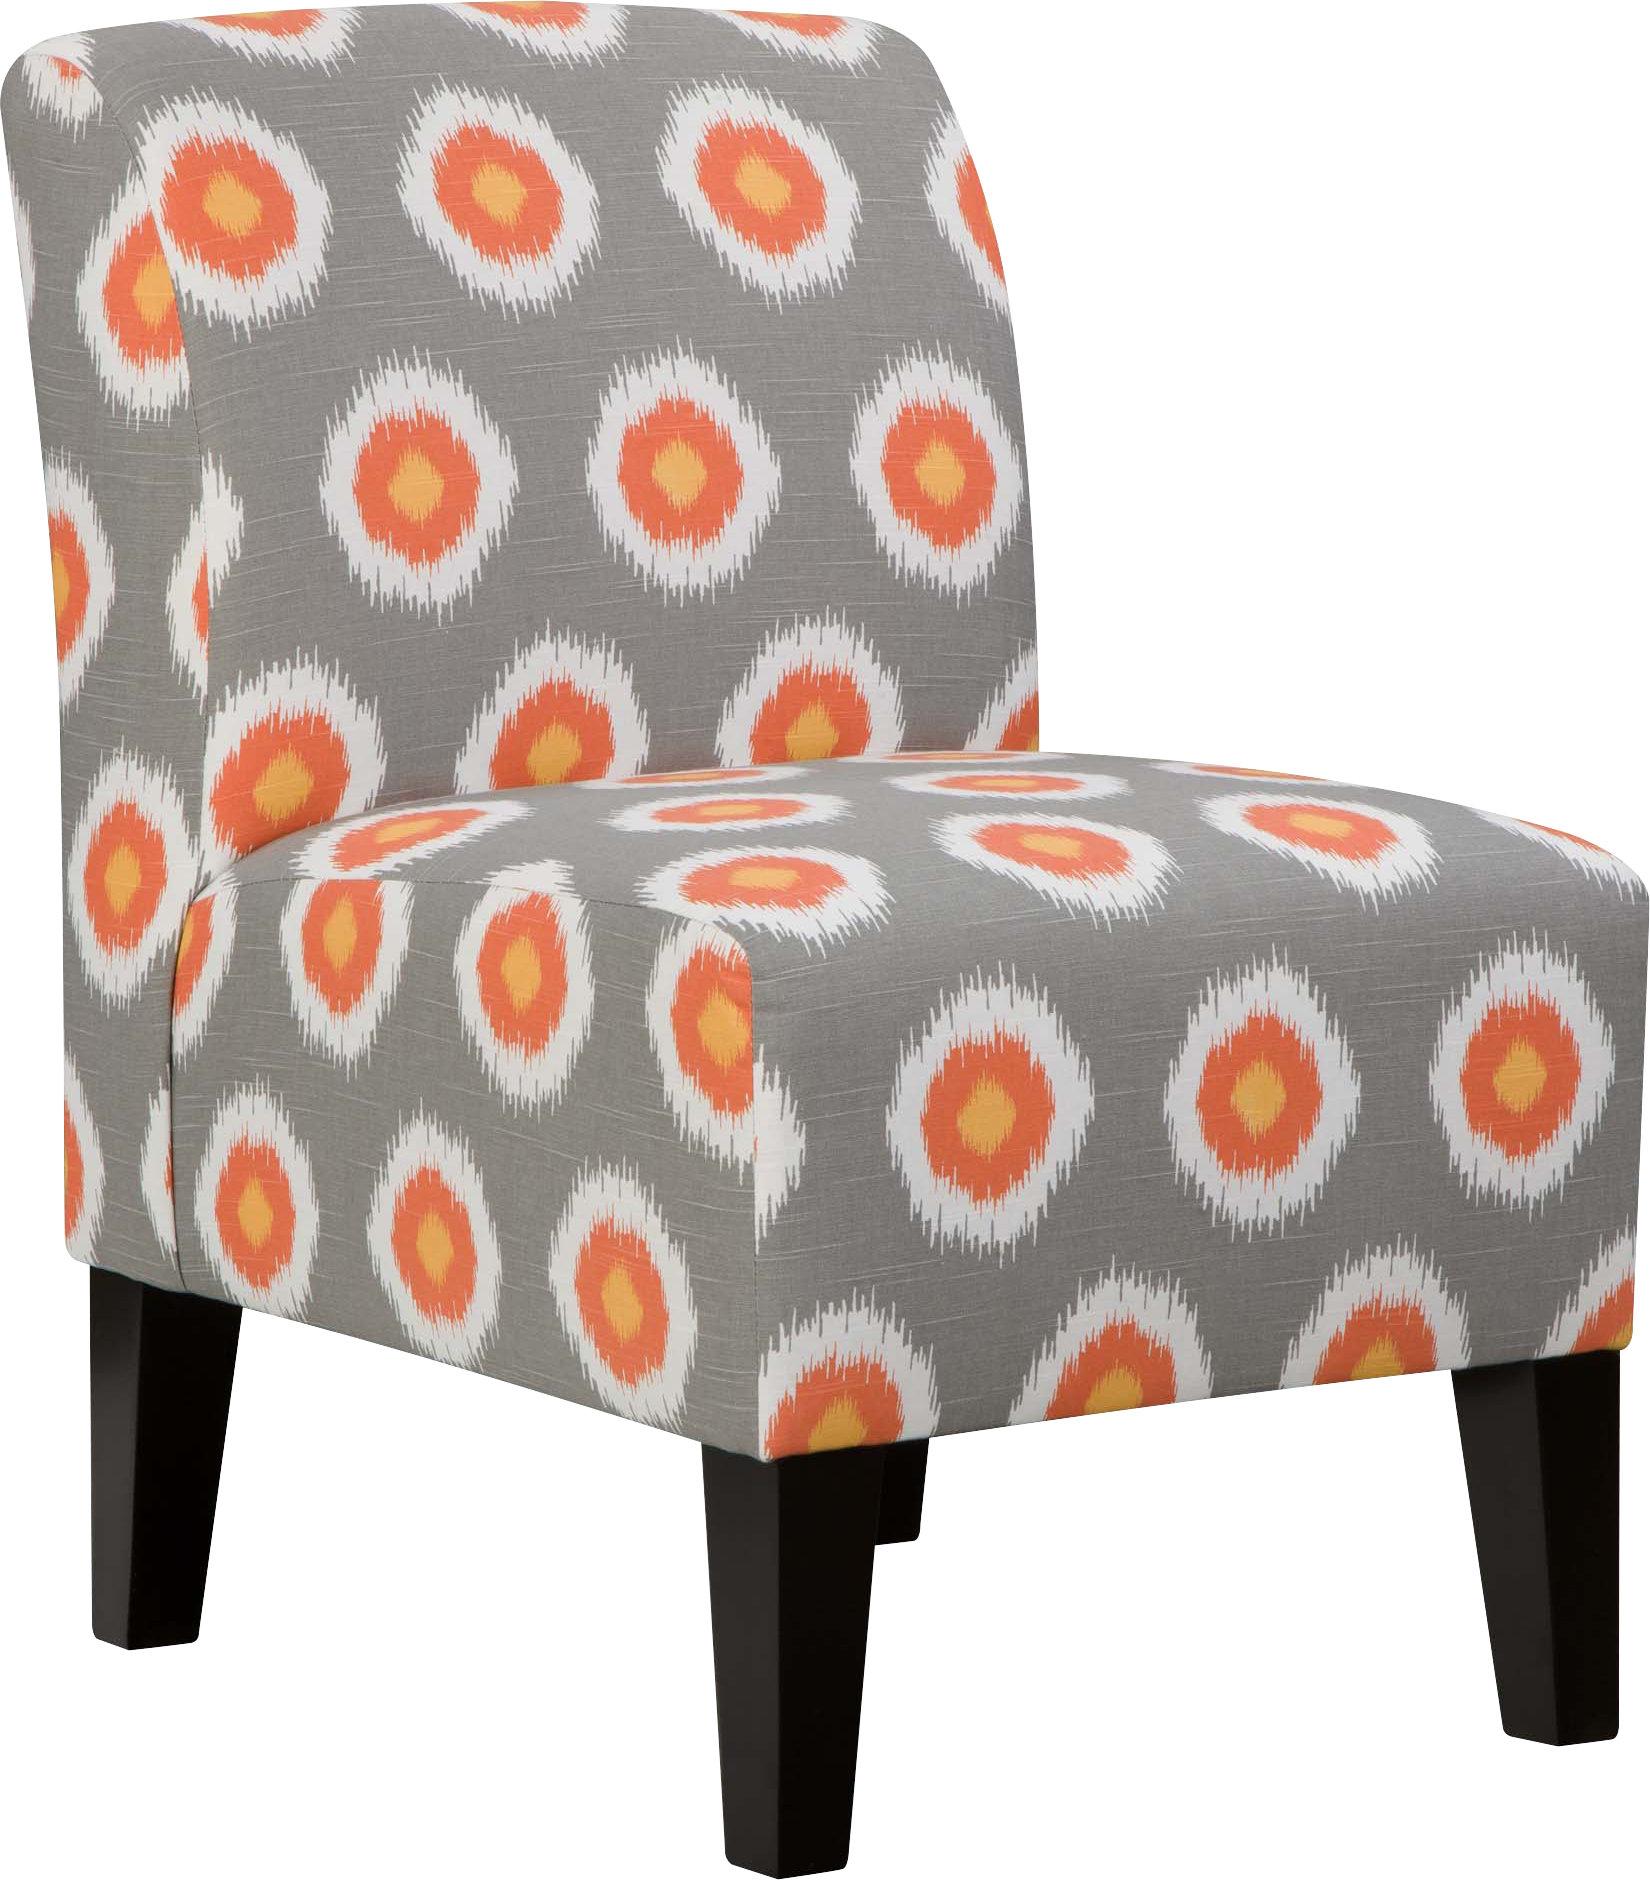 Ebern Designs Bigham Slipper Chair By Simmons Upholstery U0026 Reviews | Wayfair